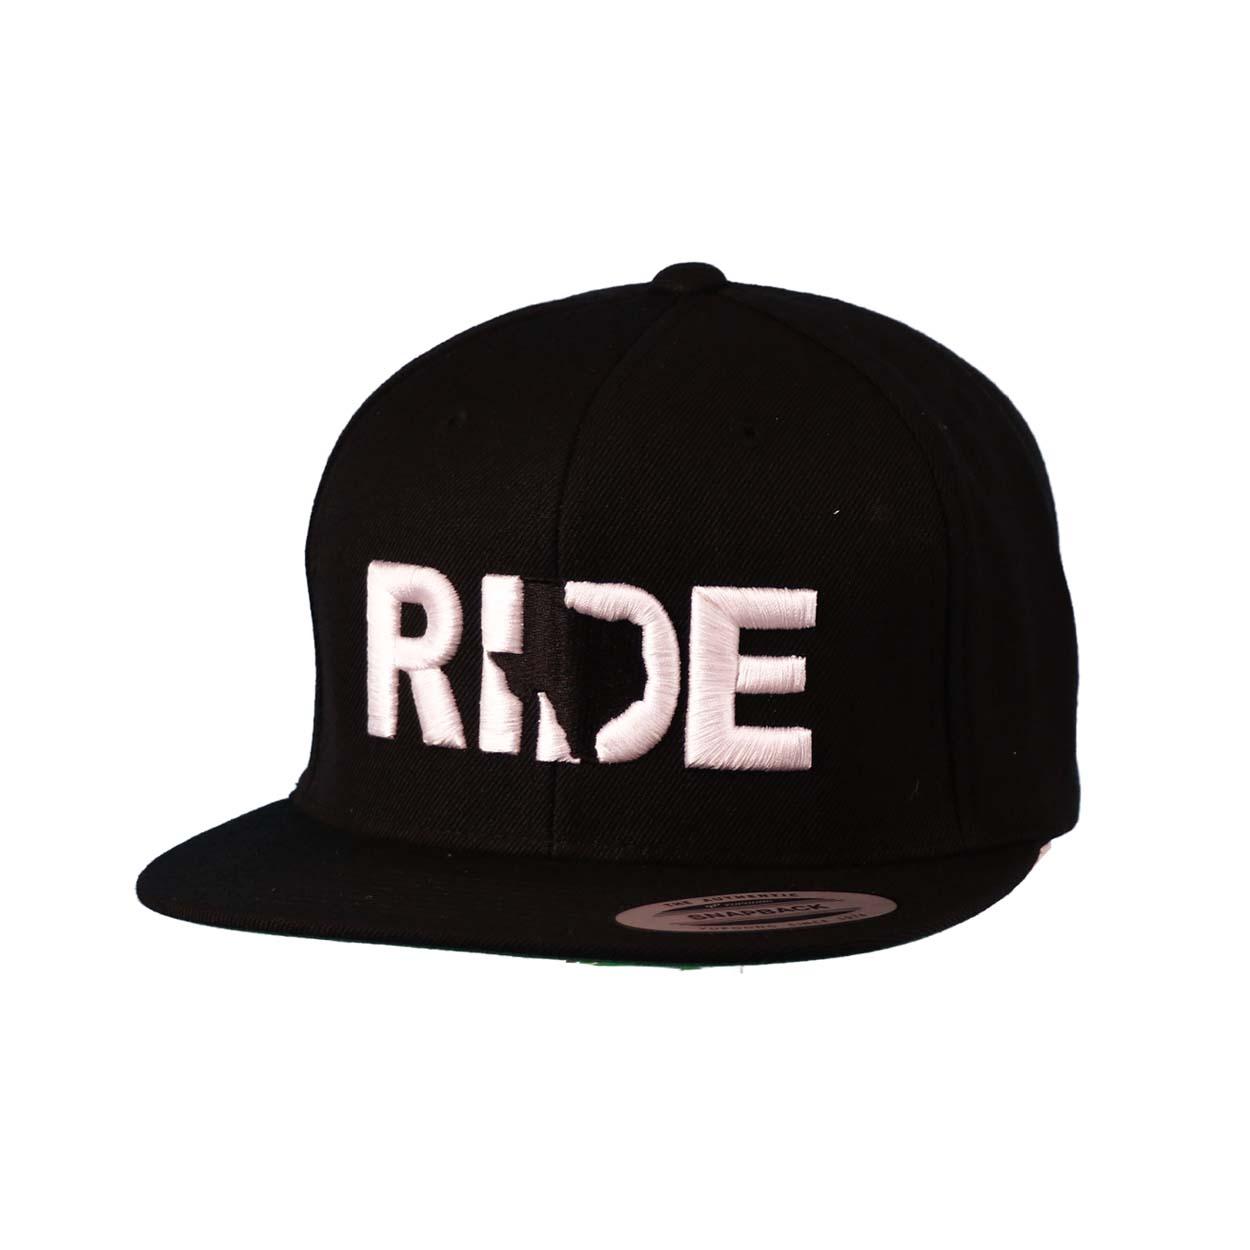 Ride Texas Classic Embroidered Snapback Flat Brim Hat Black/White